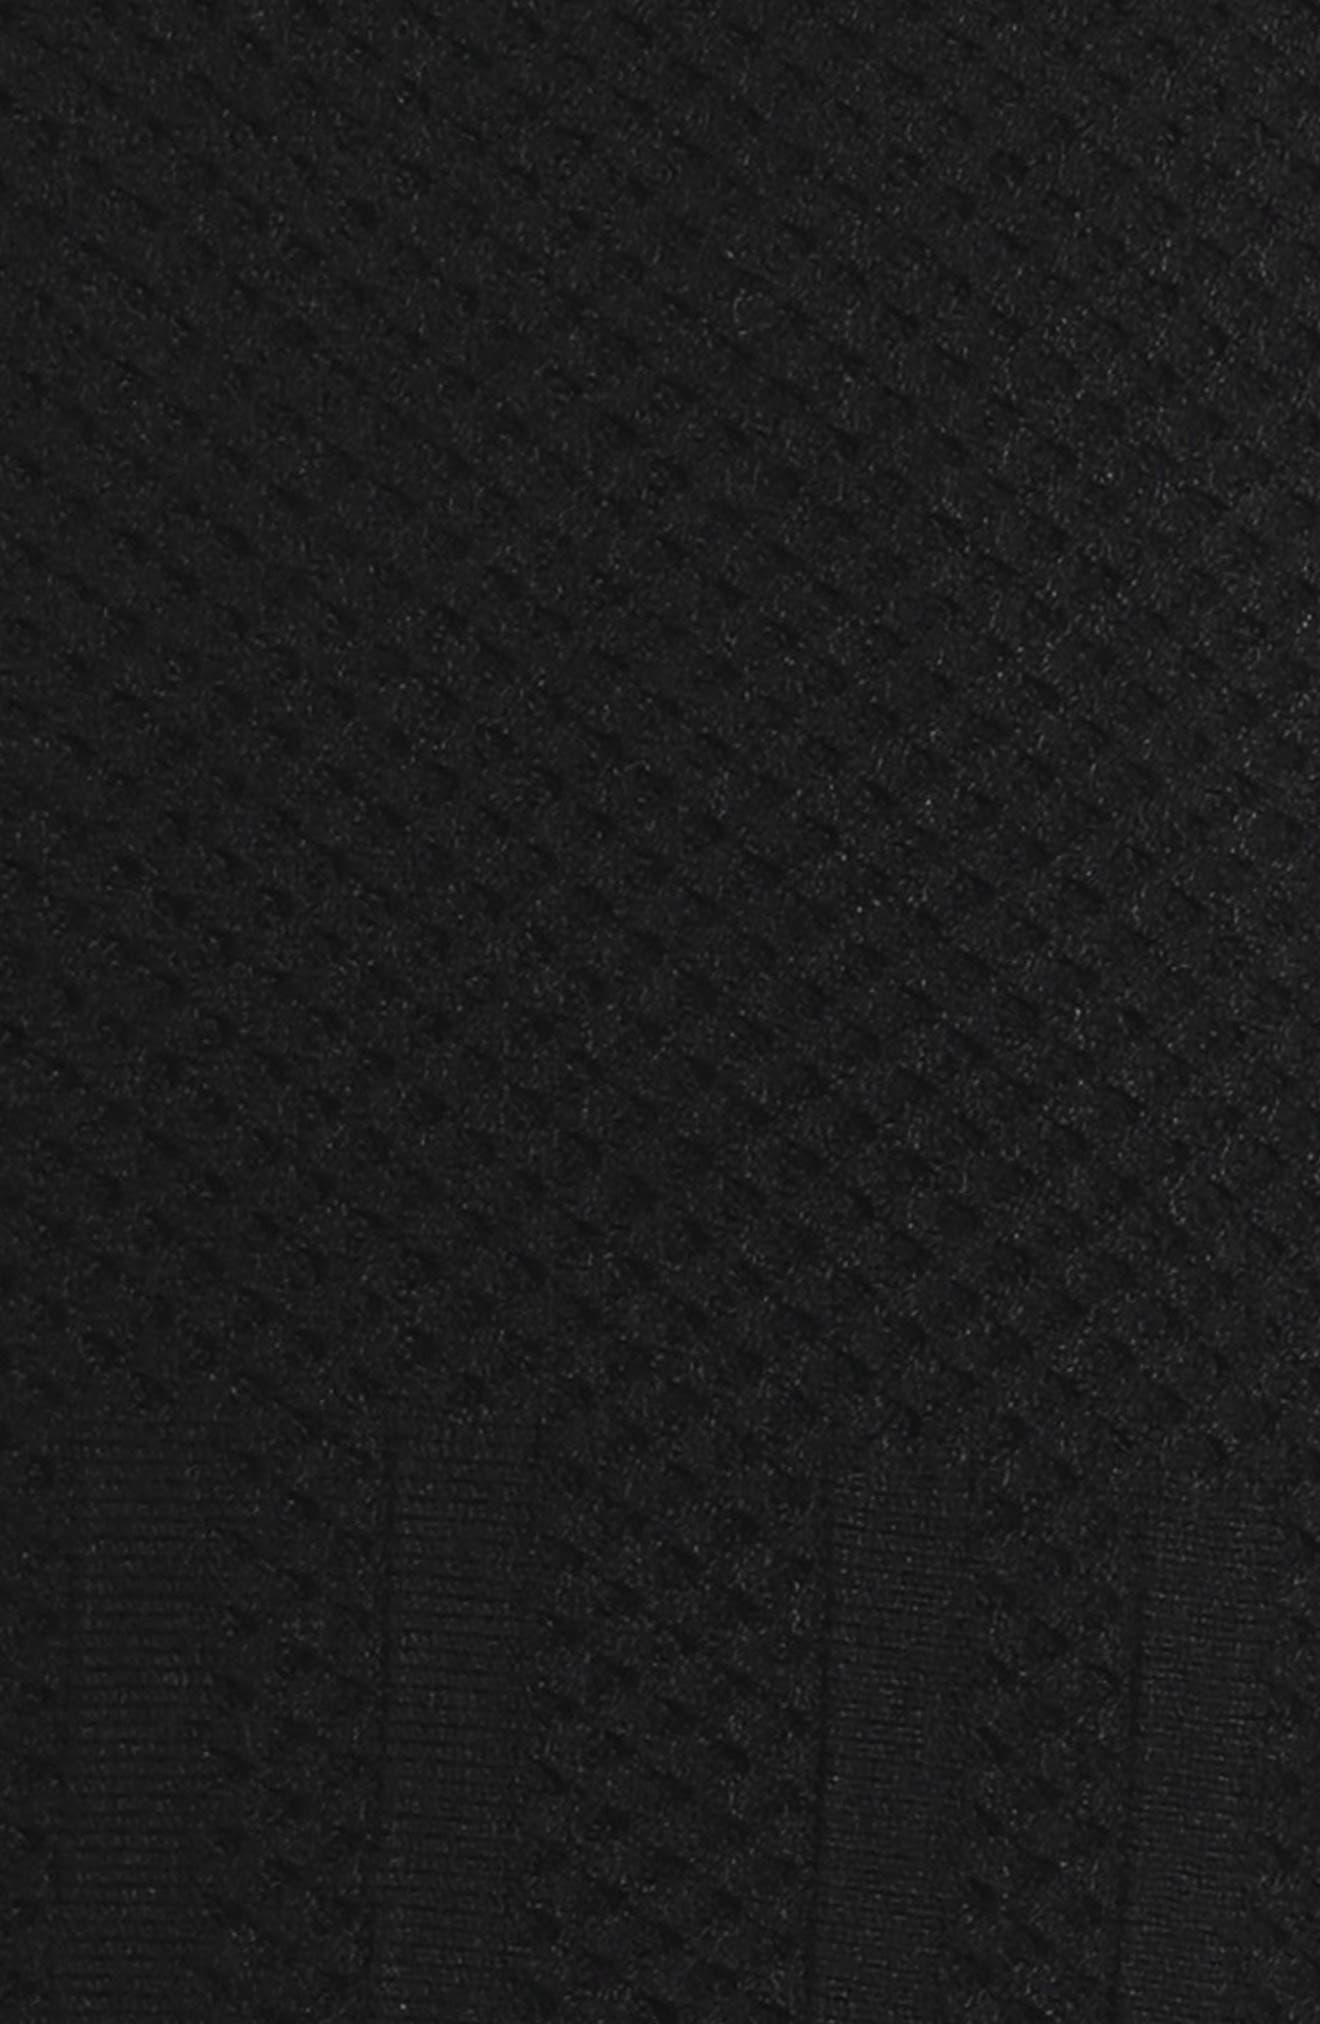 Peplum Hem Dress,                             Alternate thumbnail 3, color,                             Black